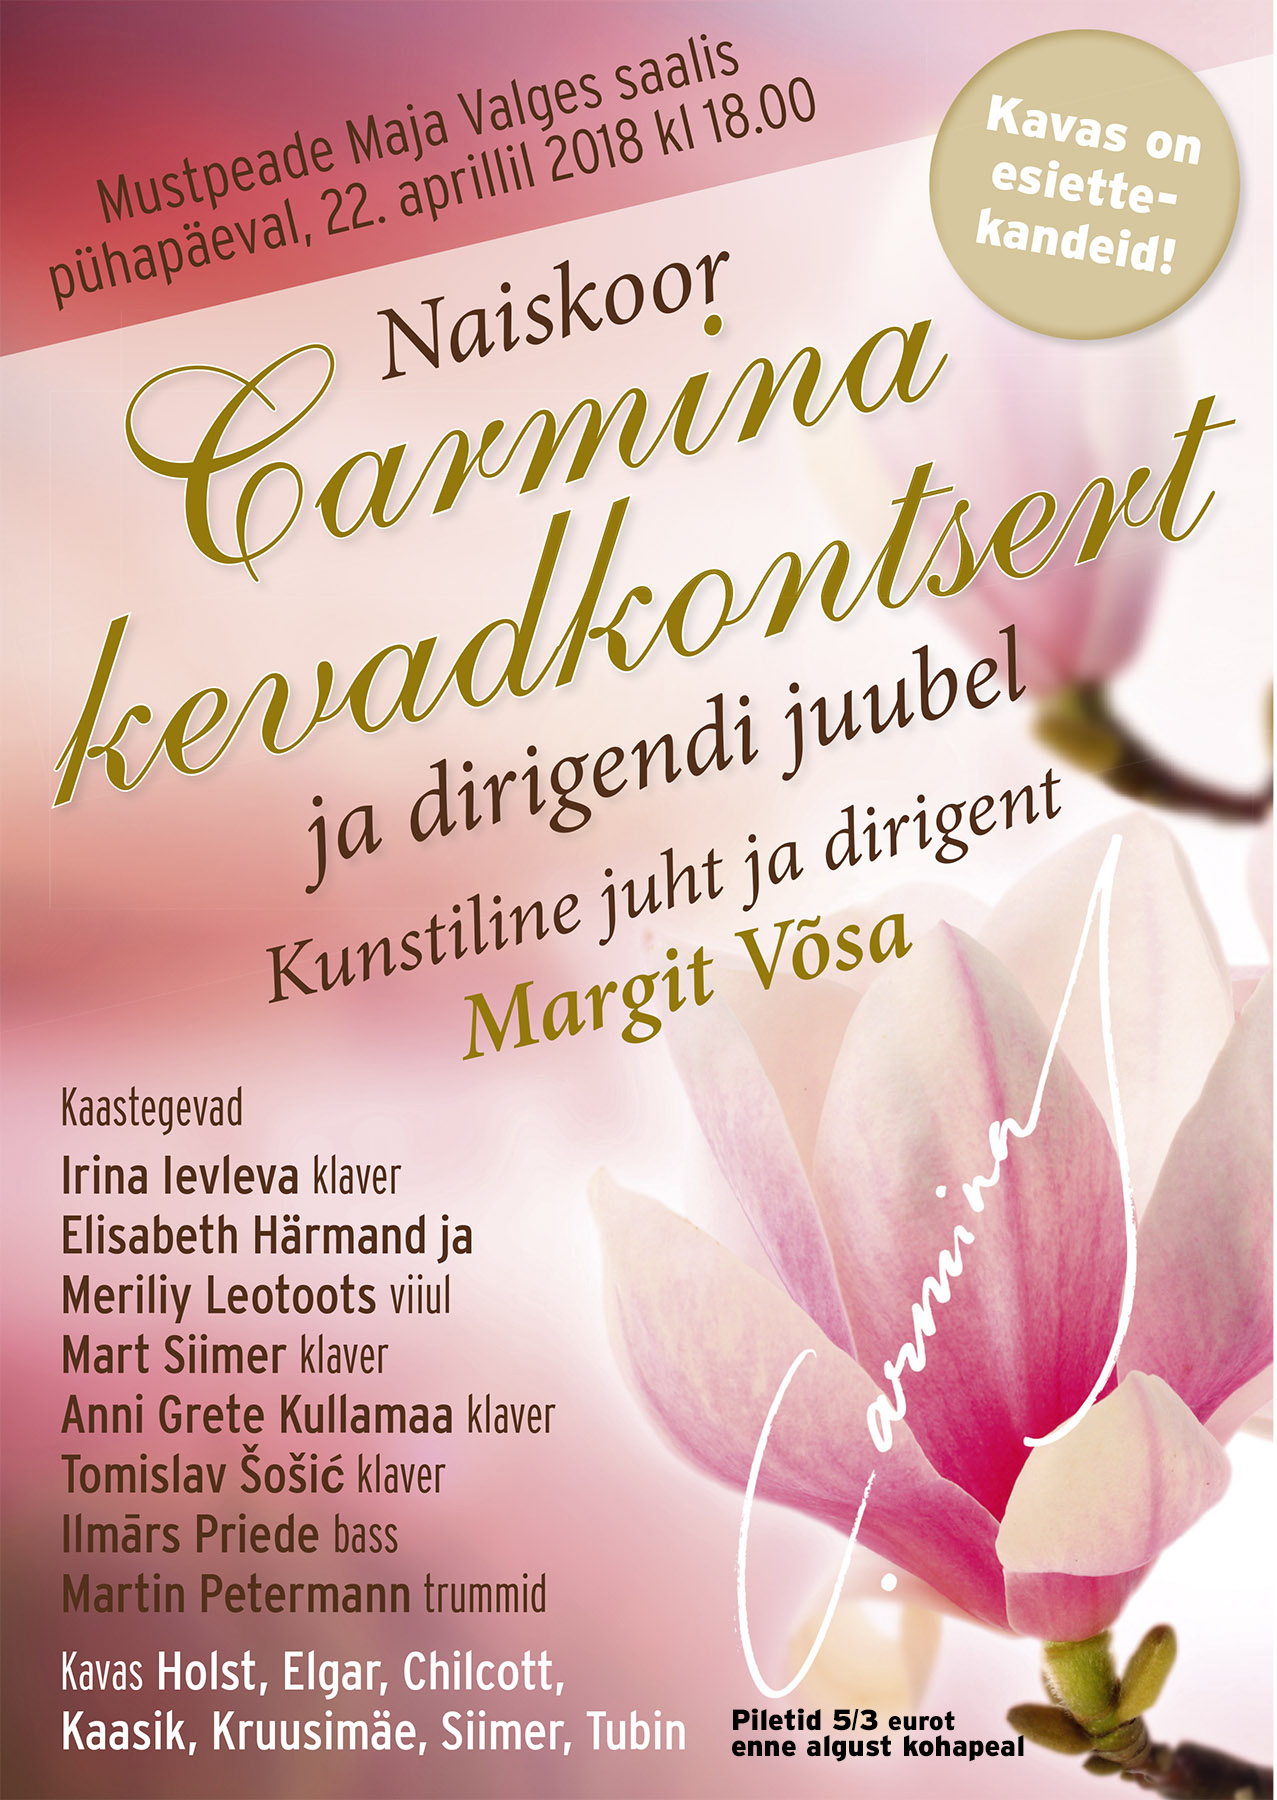 Naiskoor Carmina Kevadkontsert